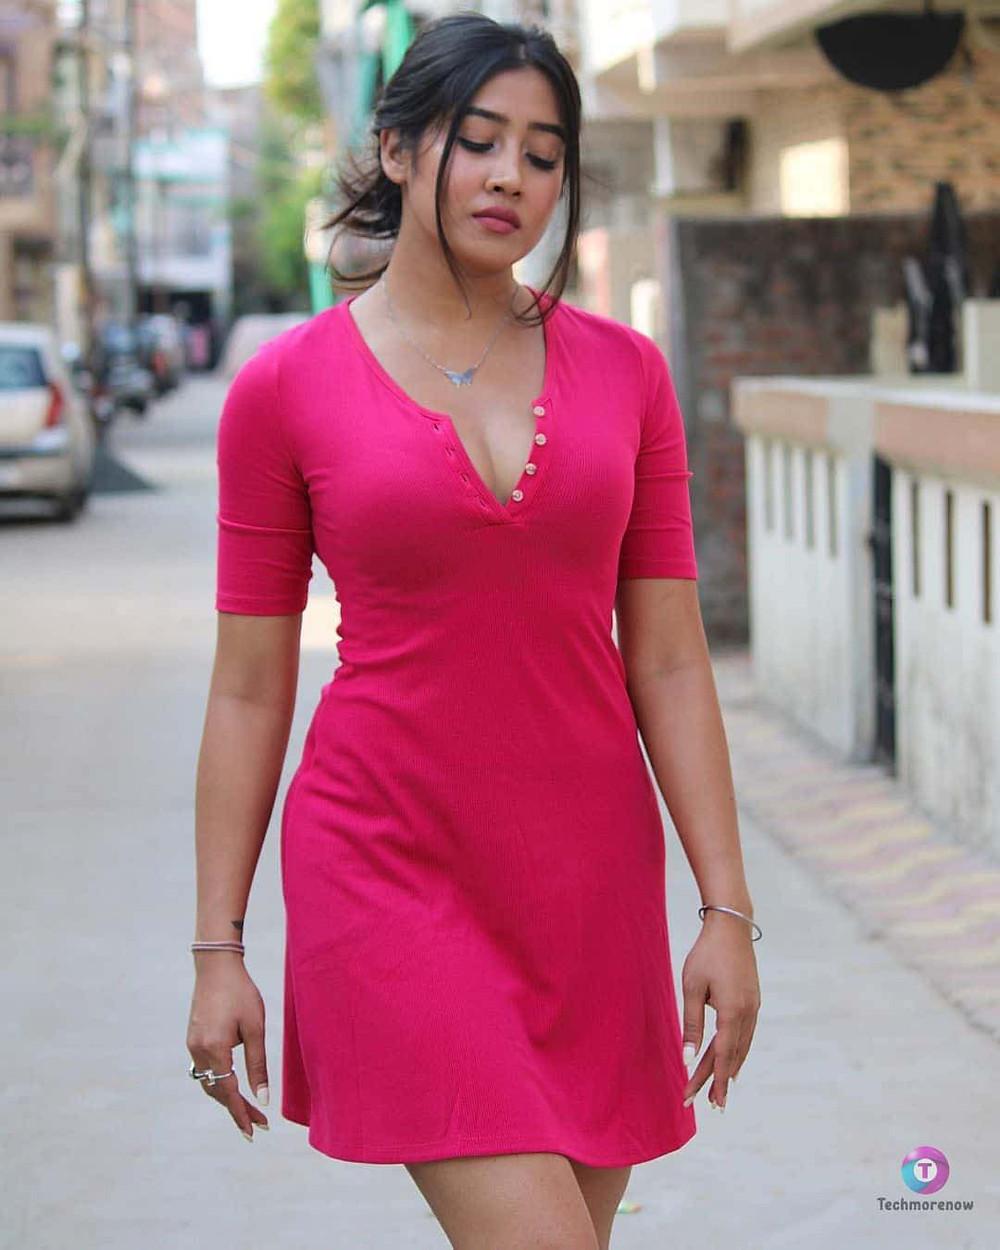 Sofia Ansari Net Worth